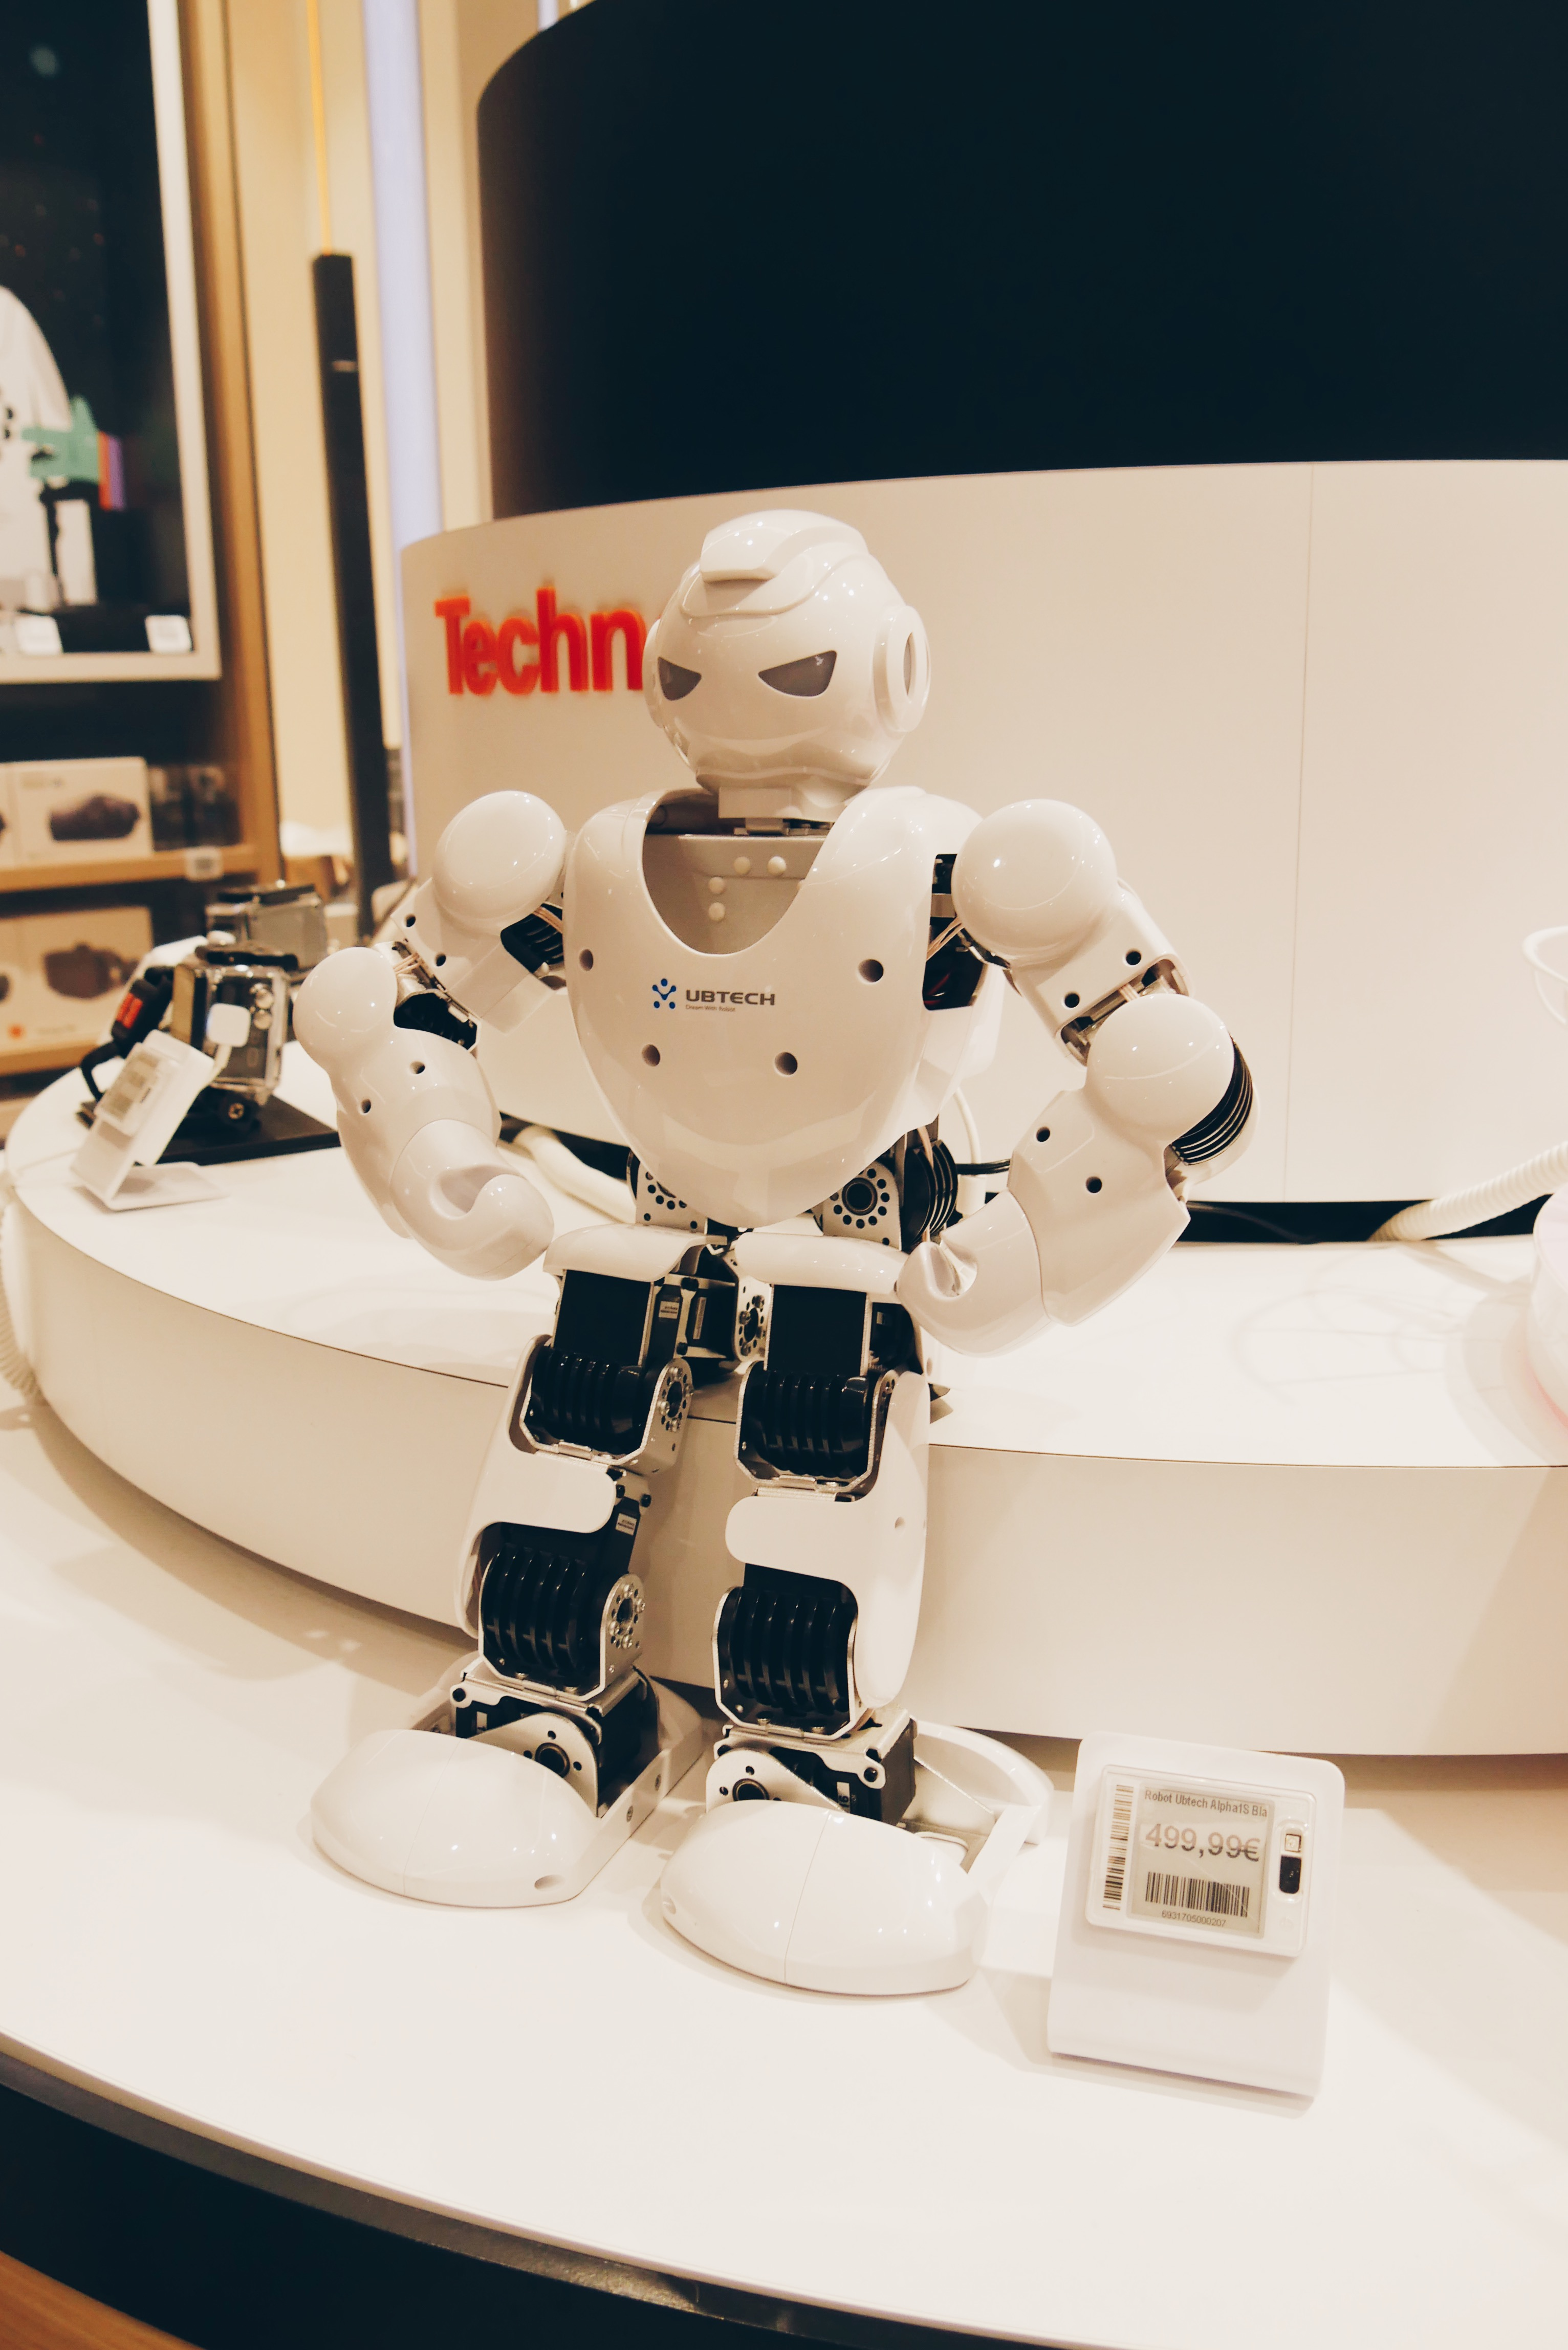 Robot-humanoide-Alpha-1S-UBTECH-boutique-Orange-Opéra-paris-photo-usofparis-blog